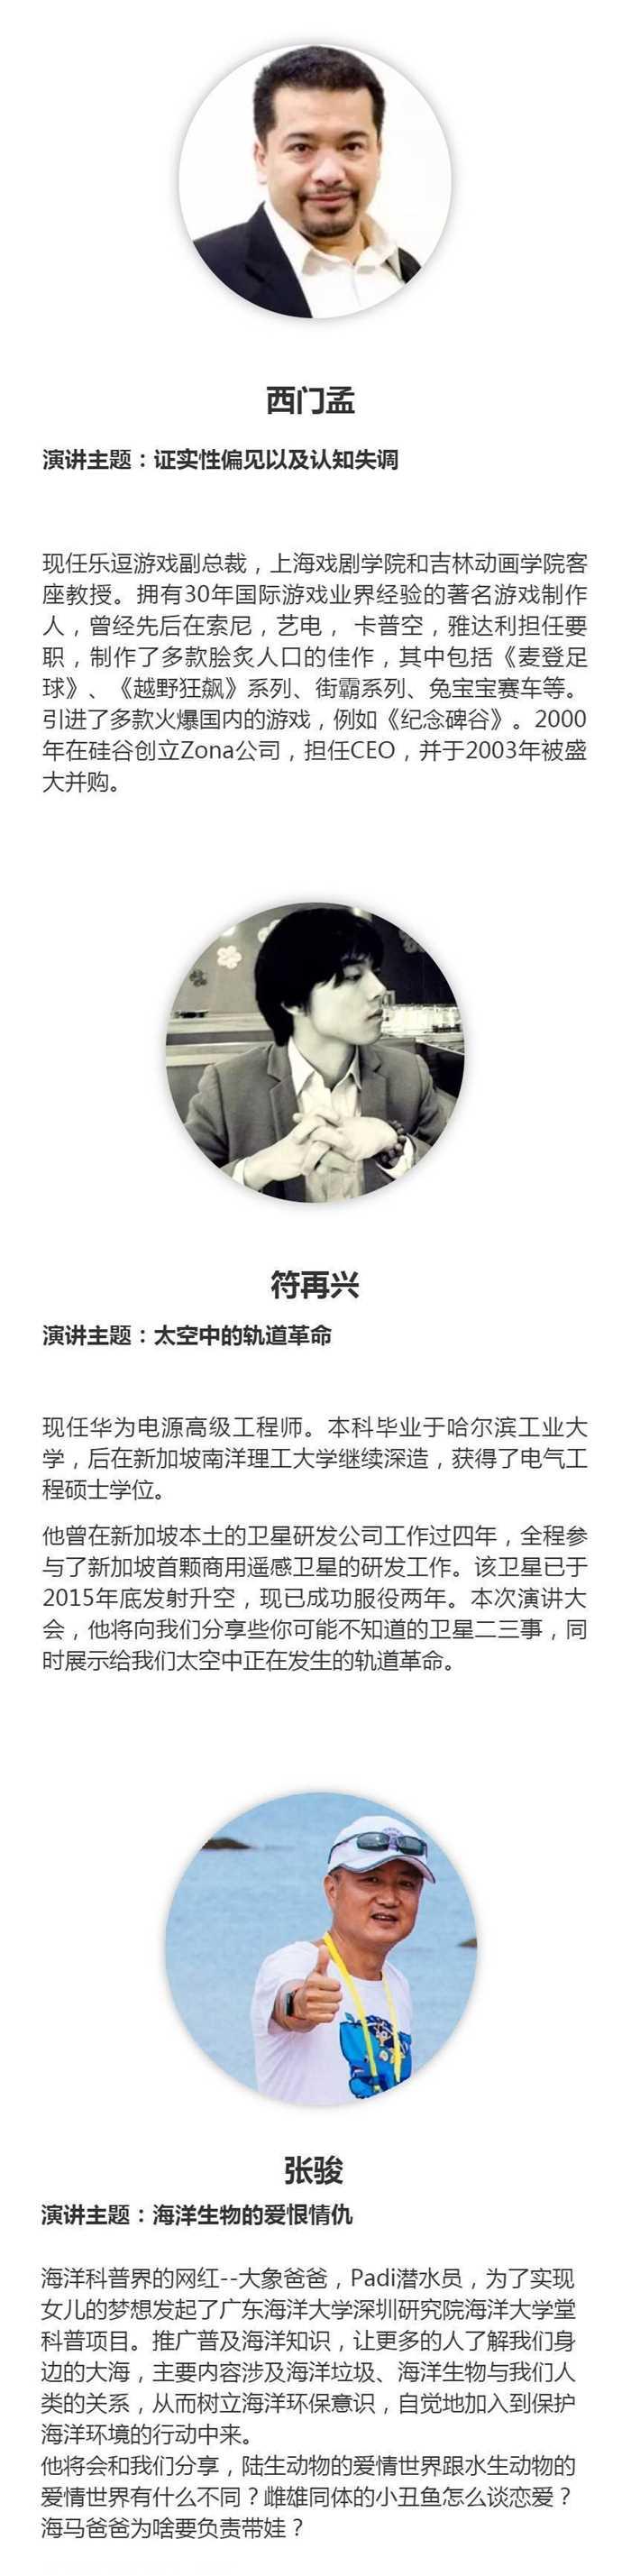 www.huodongxing.com_event_14142412094001.jpg